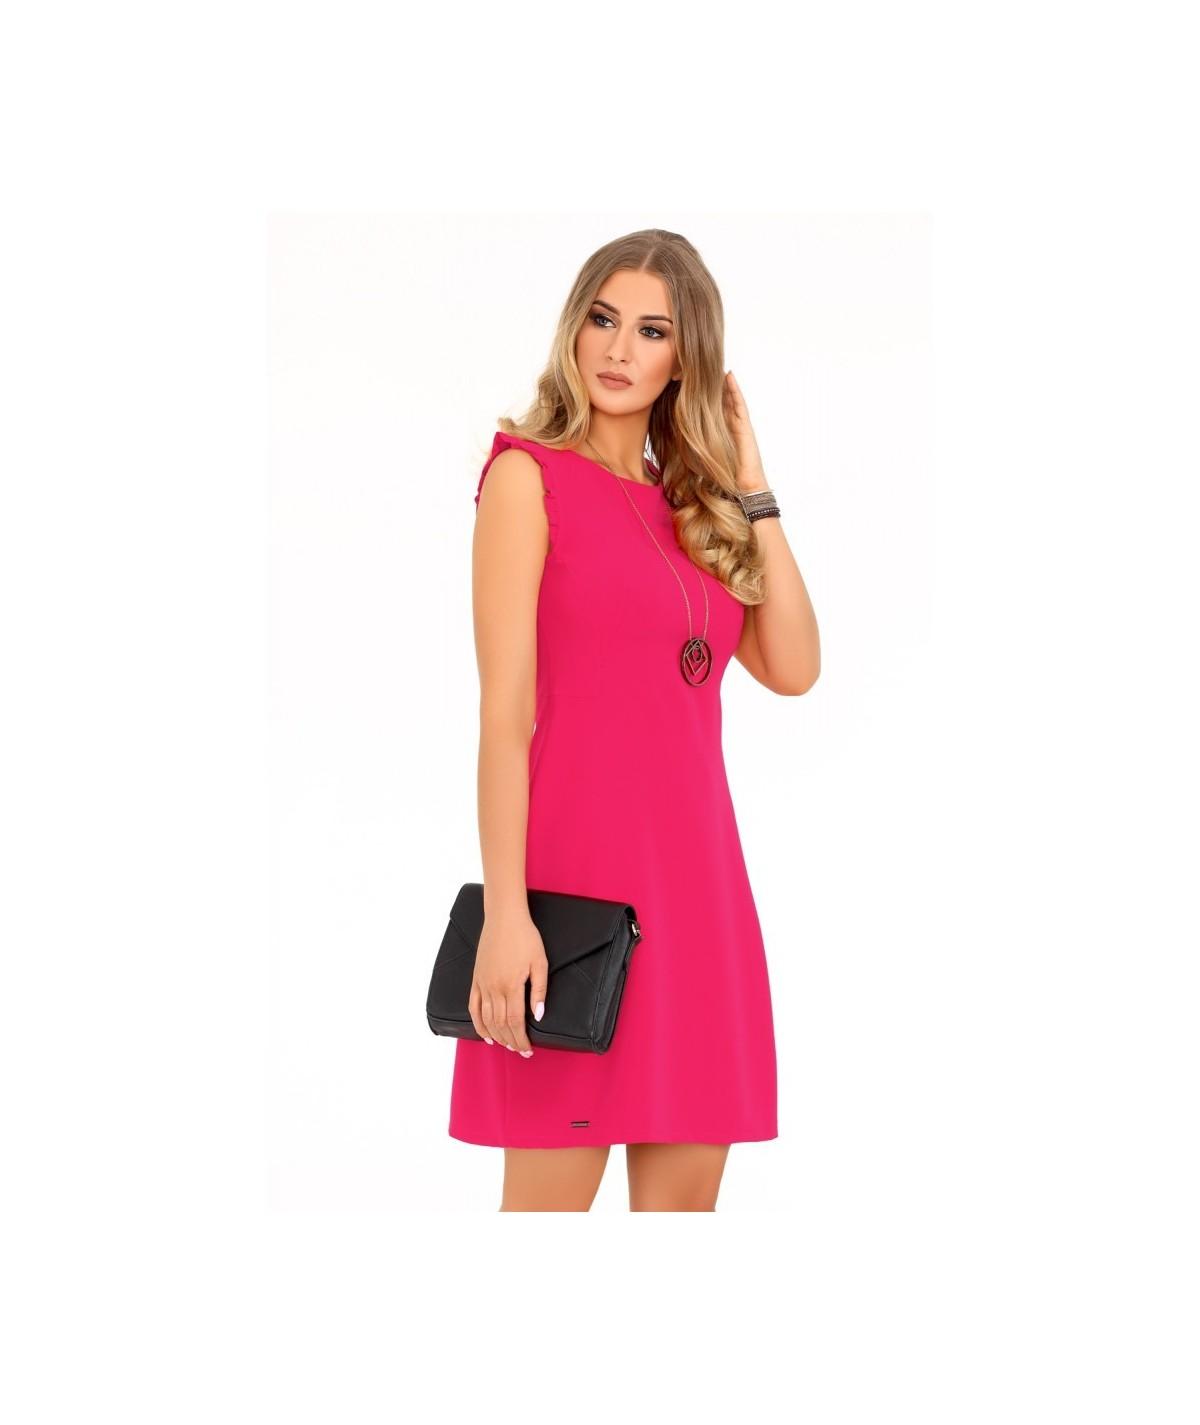 malinowa biznesowa sukienka